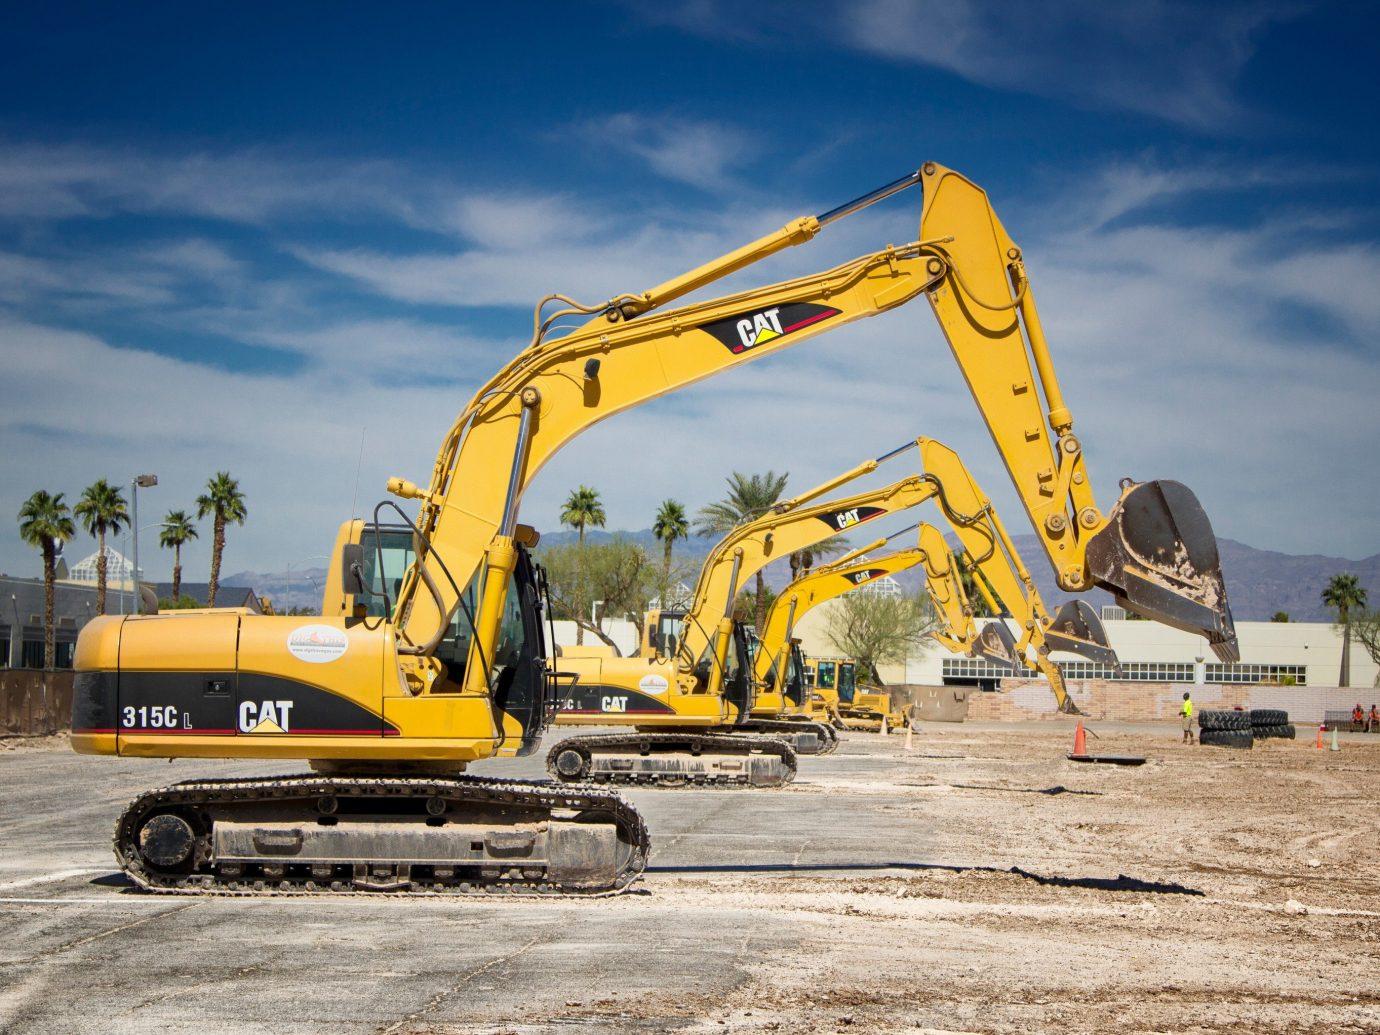 Trip Ideas sky outdoor transport power shovel ground construction equipment demolition yellow vehicle asphalt construction bulldozer